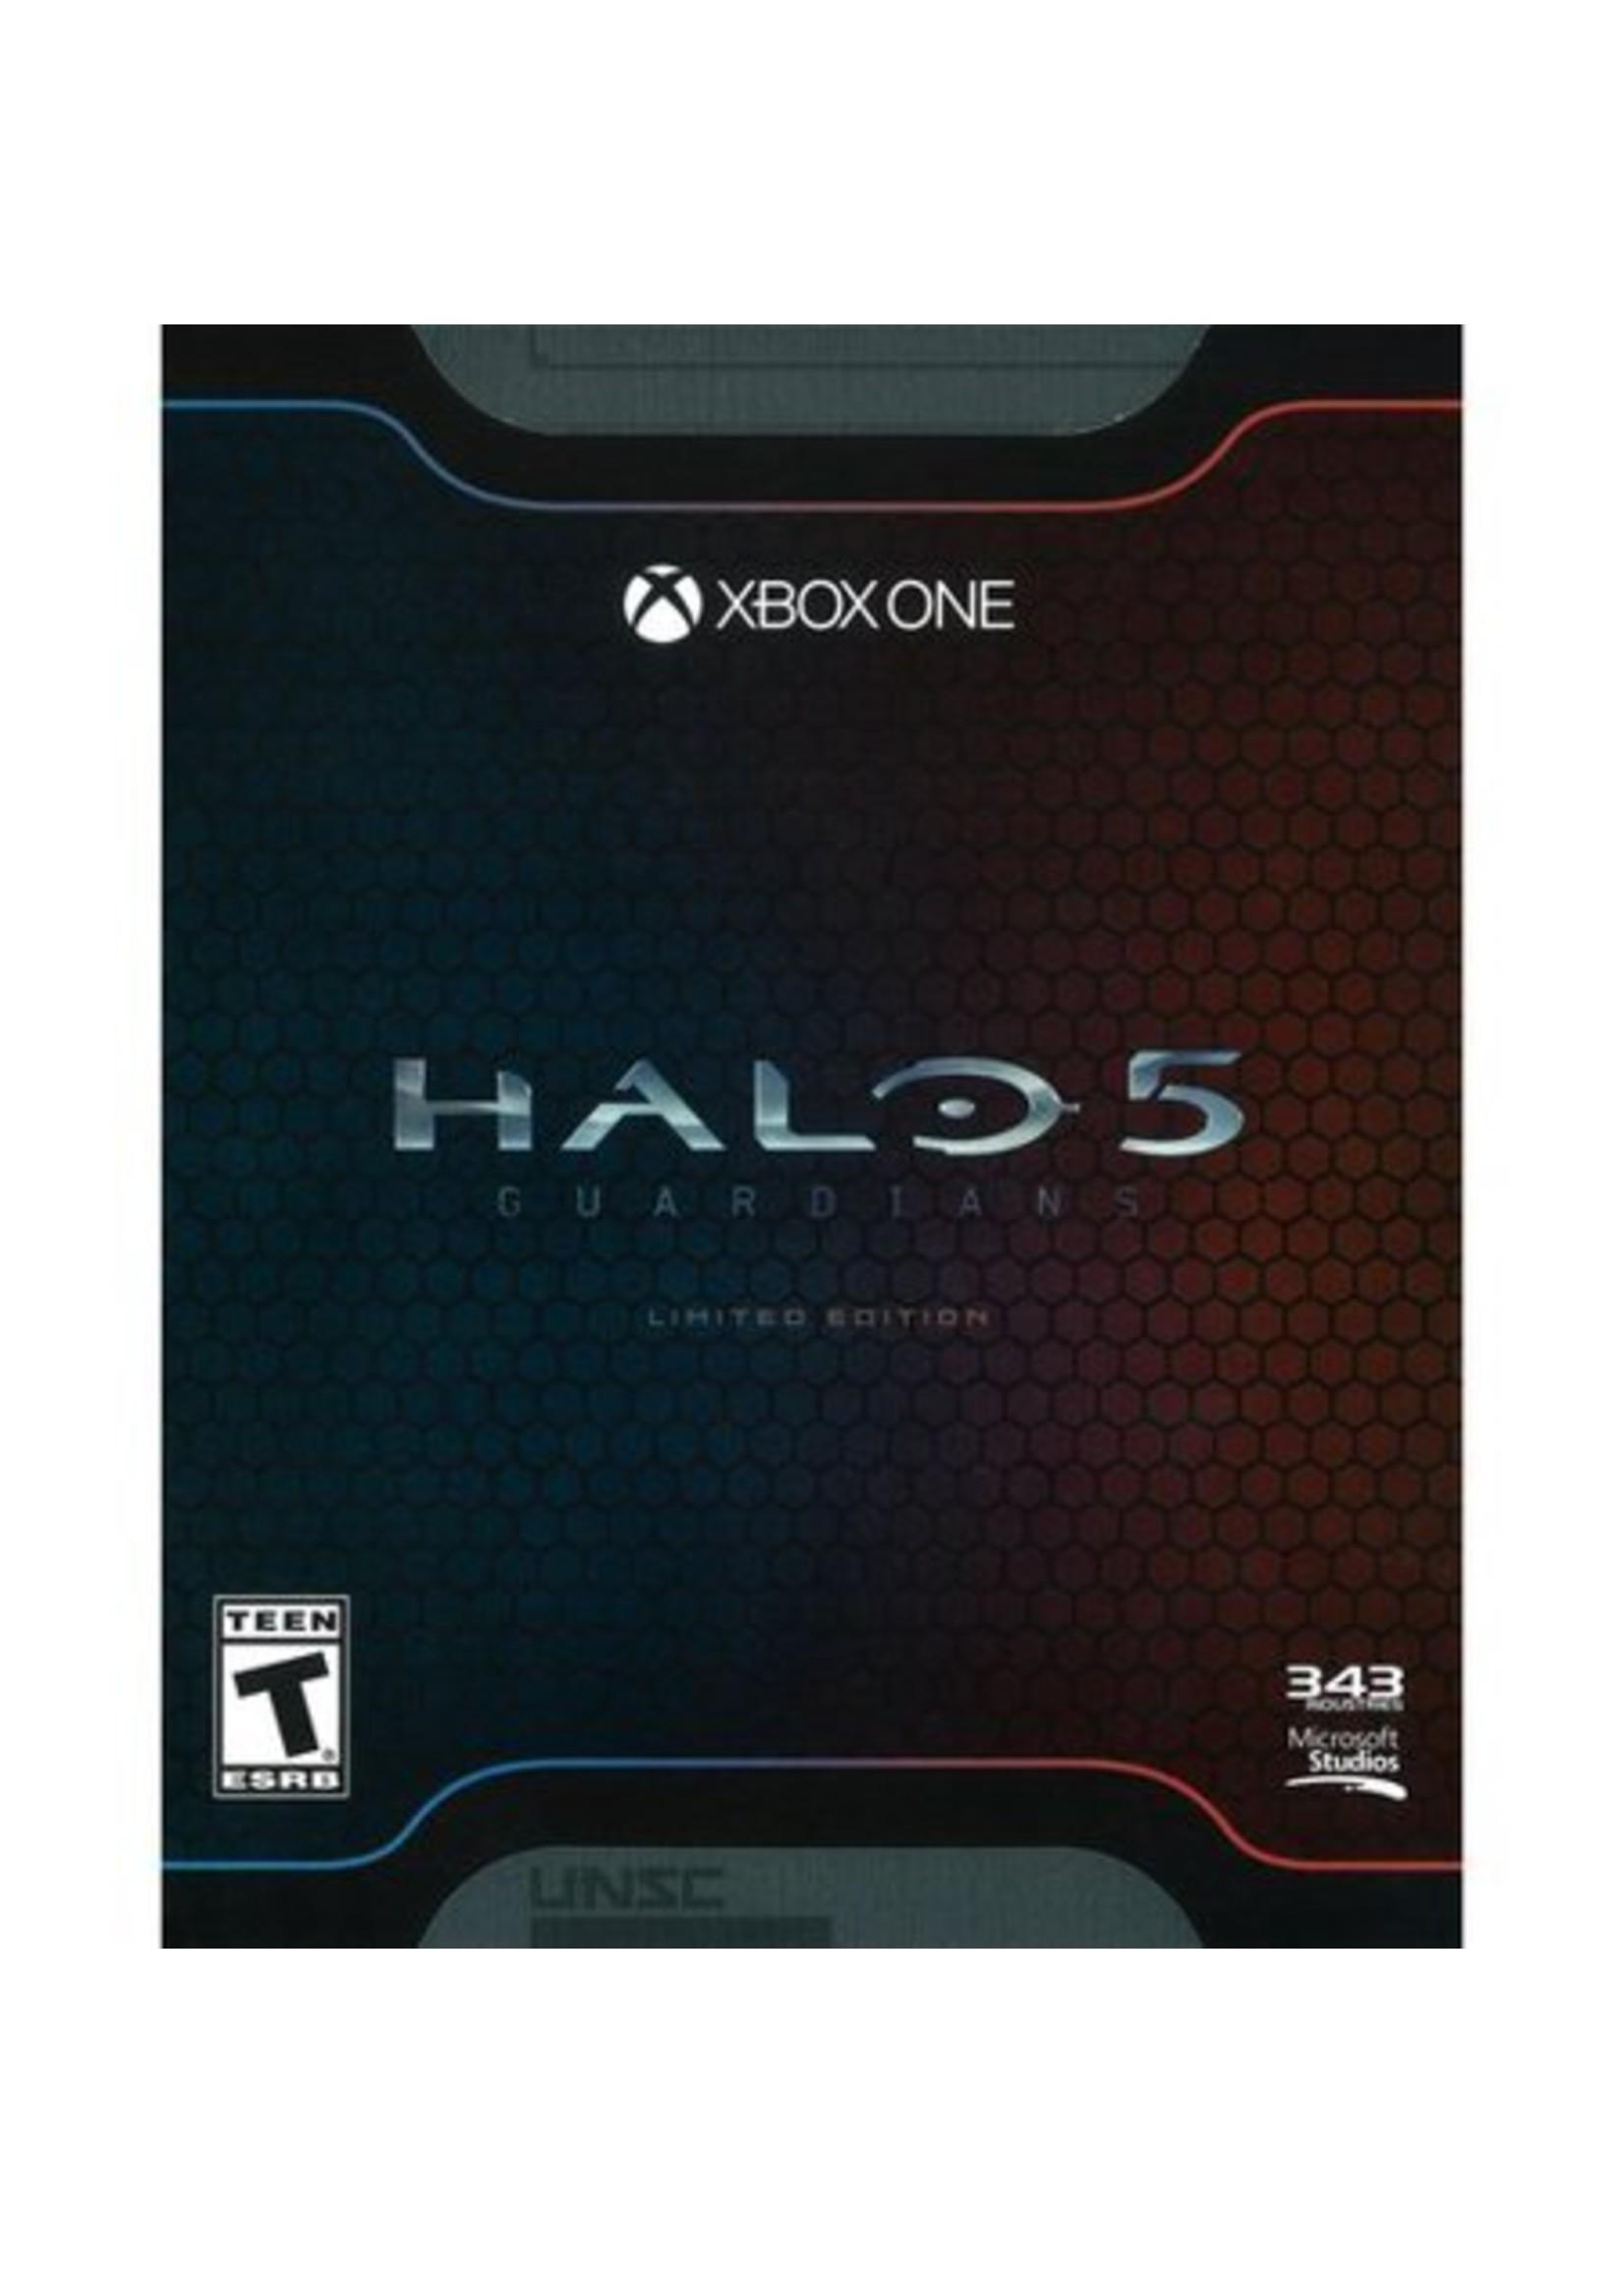 Halo 5: Guardians Limited Edition - XBOne PrePlayed